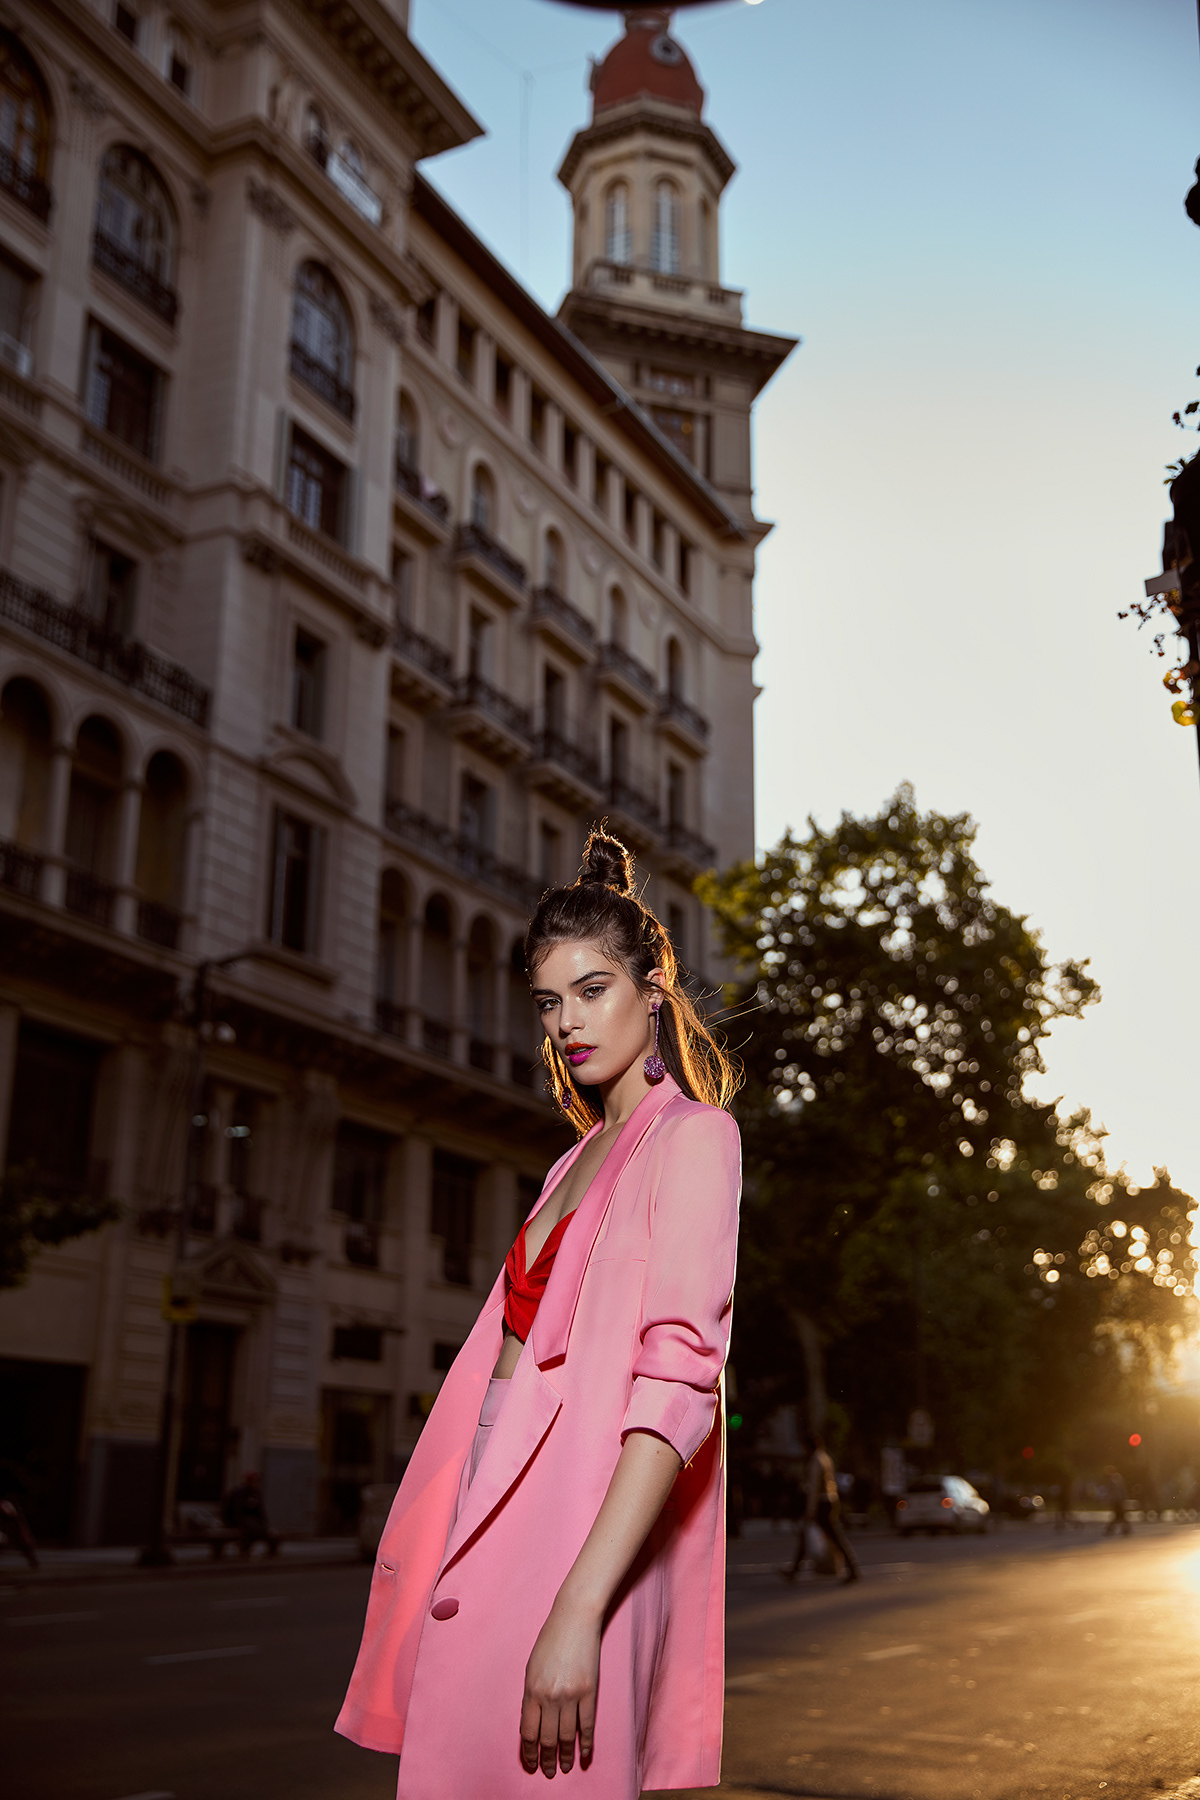 argentina,buenos aires,caminito,colors,floklore,La Boca,Make Up,night,Pizza,tango